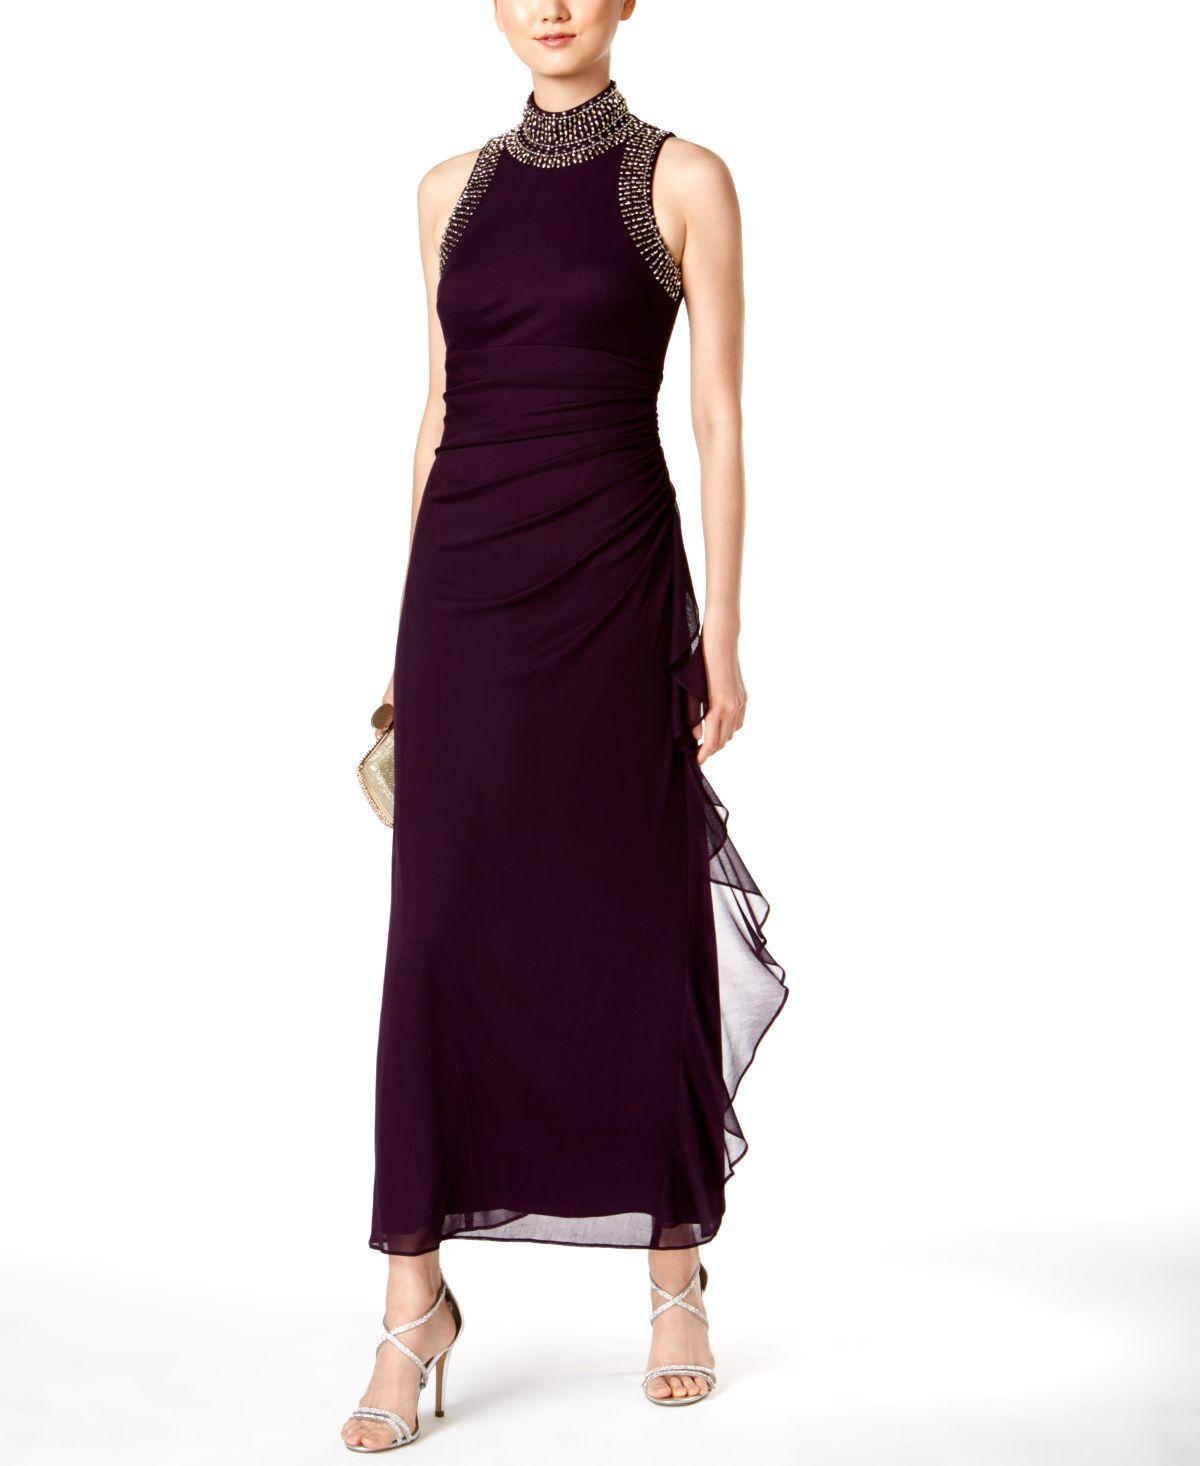 BETSY & ADAM damen lila SLEEVELESS MANDARIN COLLAR BEADED DRESS Größe 8P